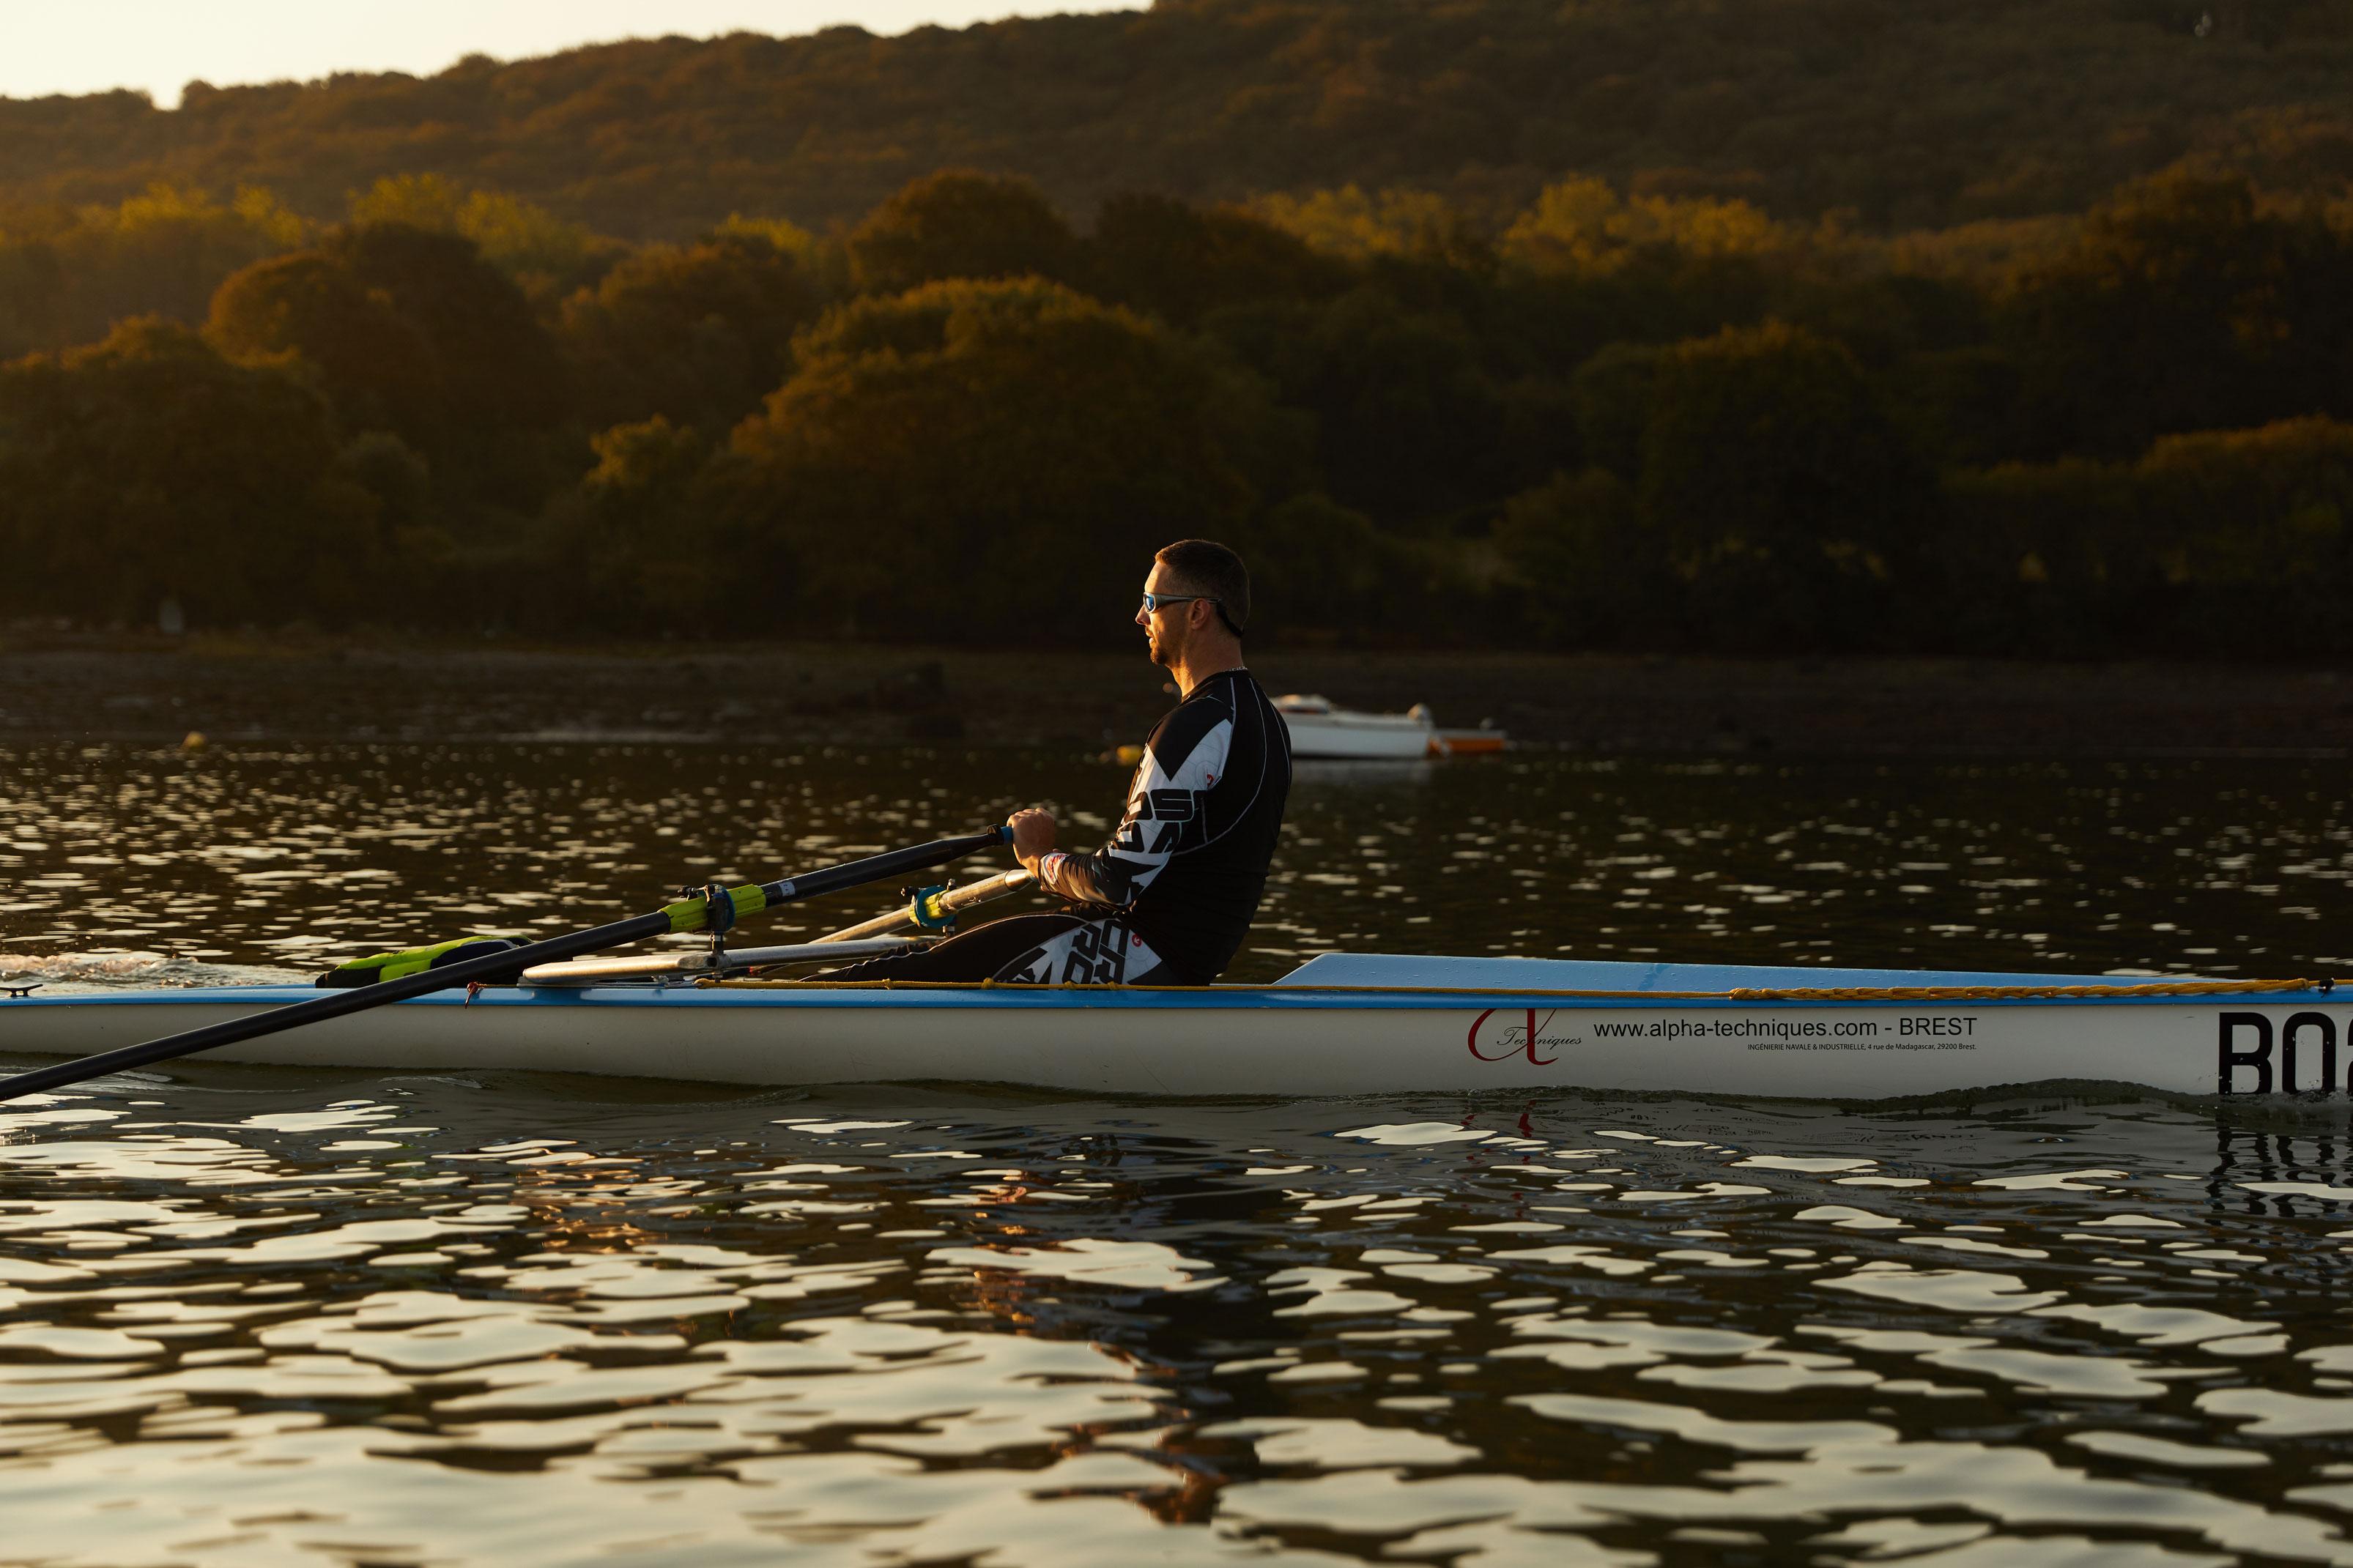 photographe outdoor sport quimper